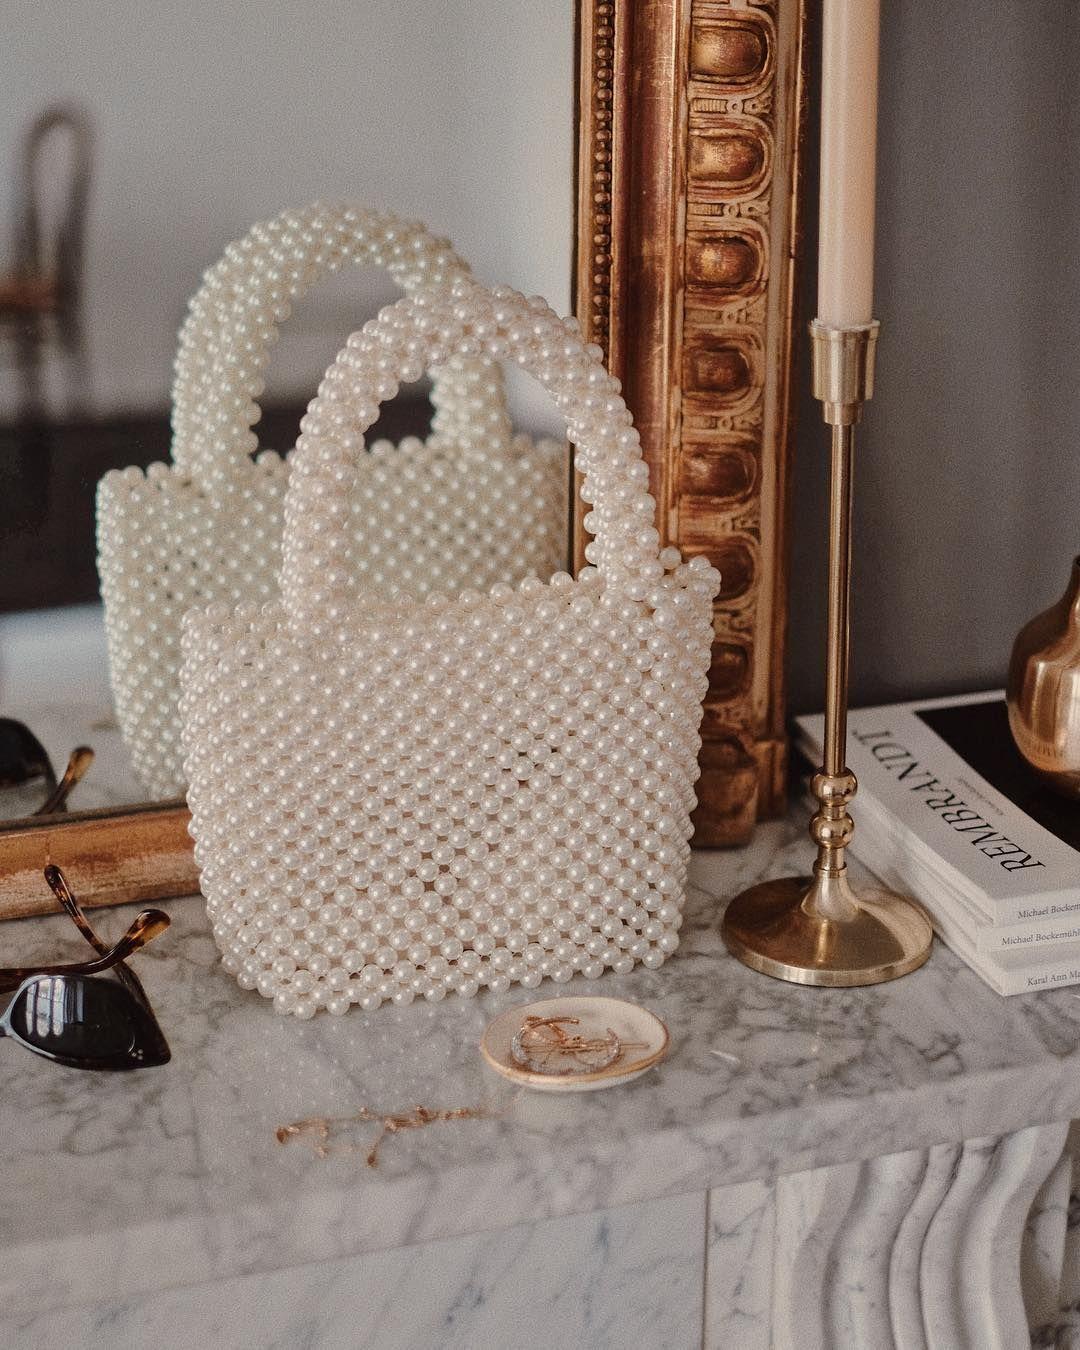 designerhandbags handbags chanel michaelkors